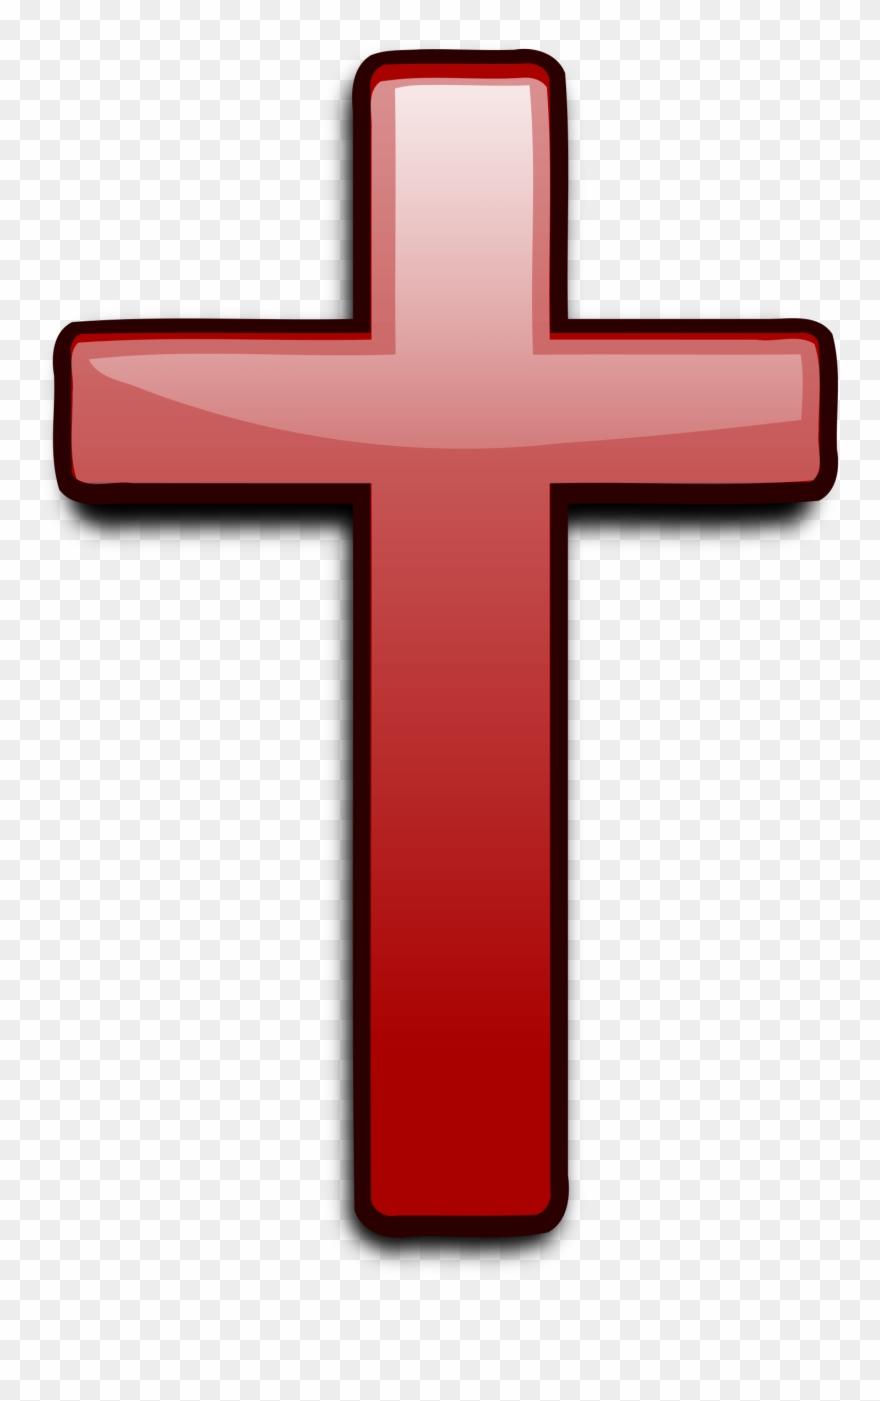 medium resolution of cross images clip art red cross jesus png download free download